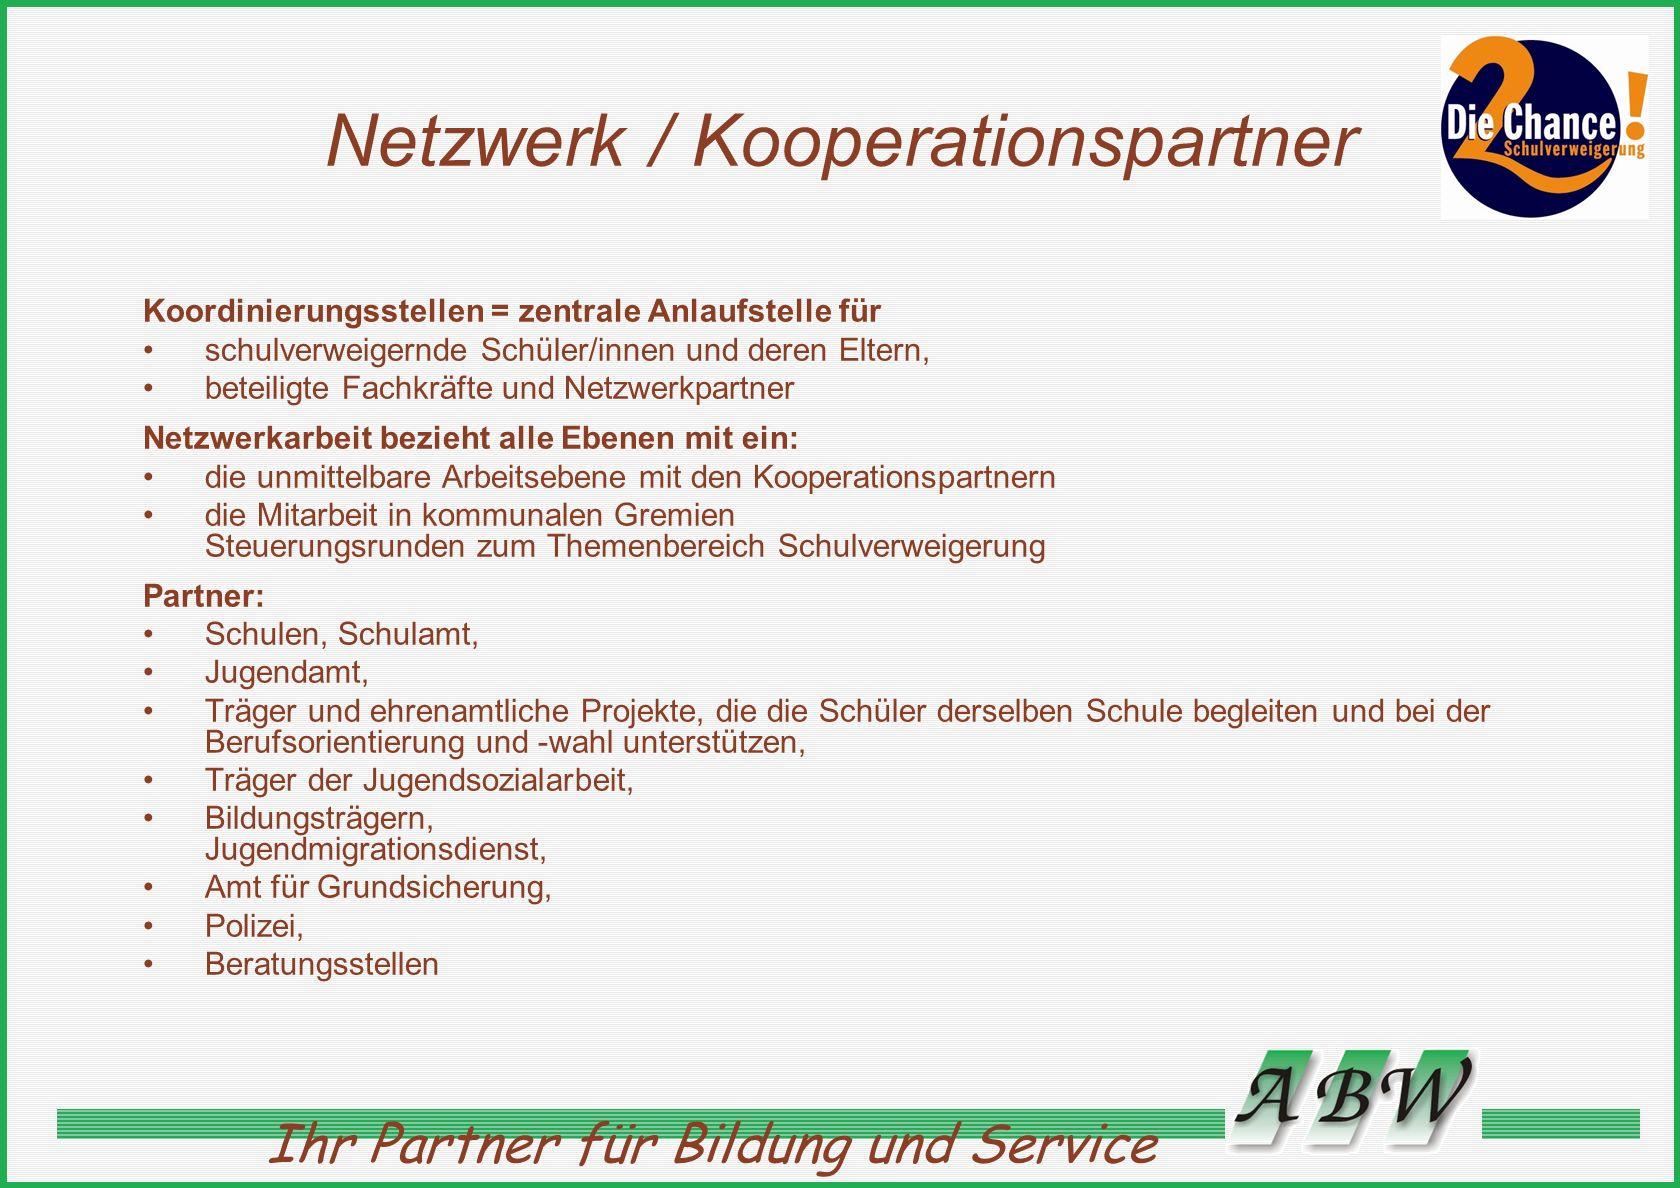 Netzwerk / Kooperationspartner